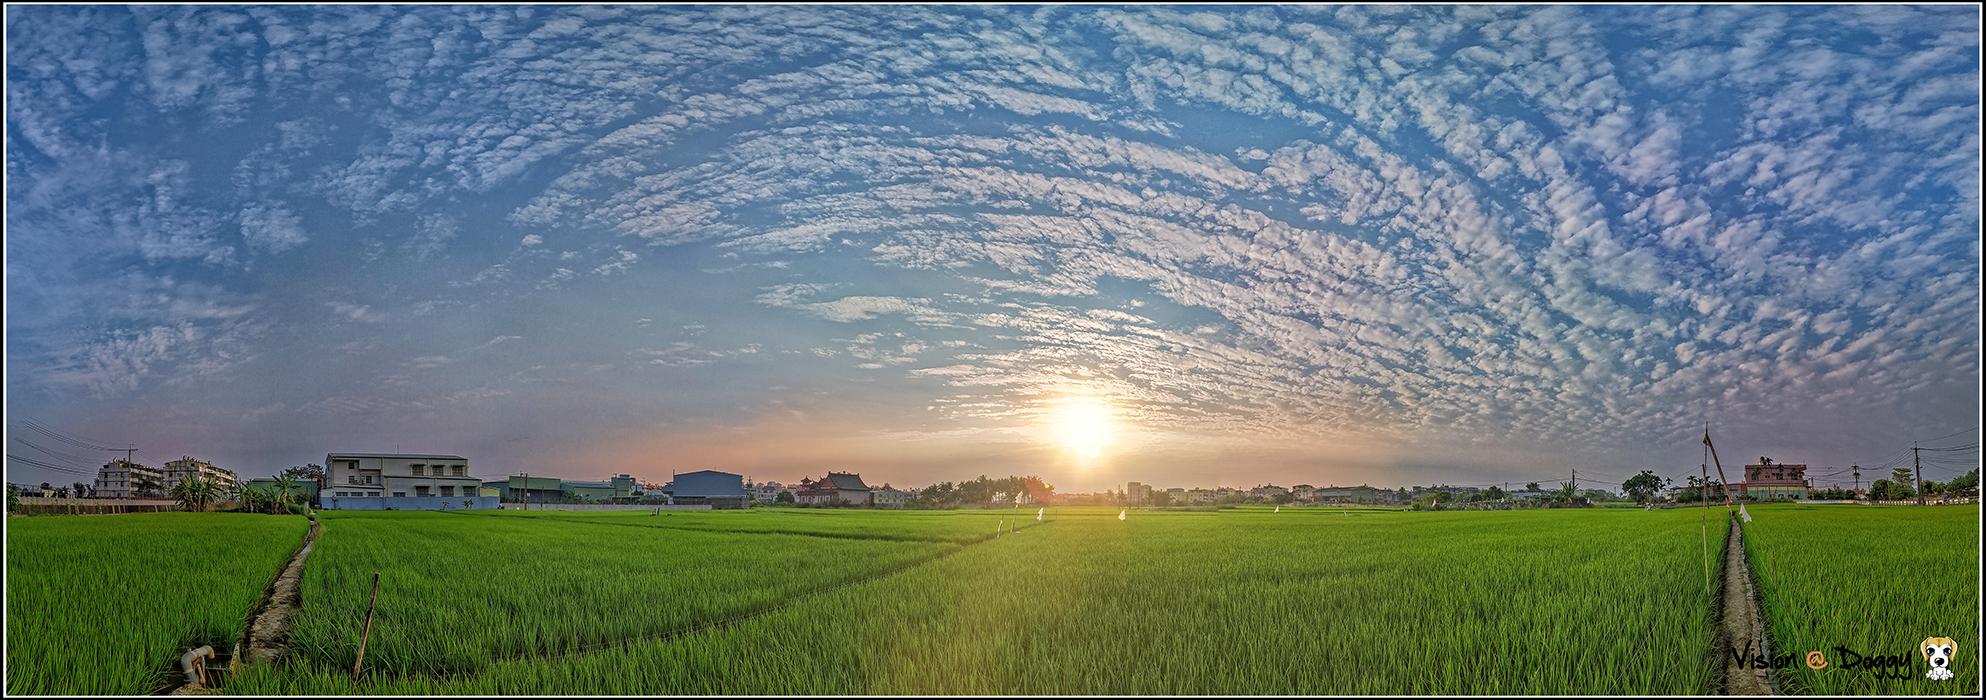 http://blog.hunternet.com.tw/wp-content/uploads/2020/03/pic-20200306-01-sunset.png